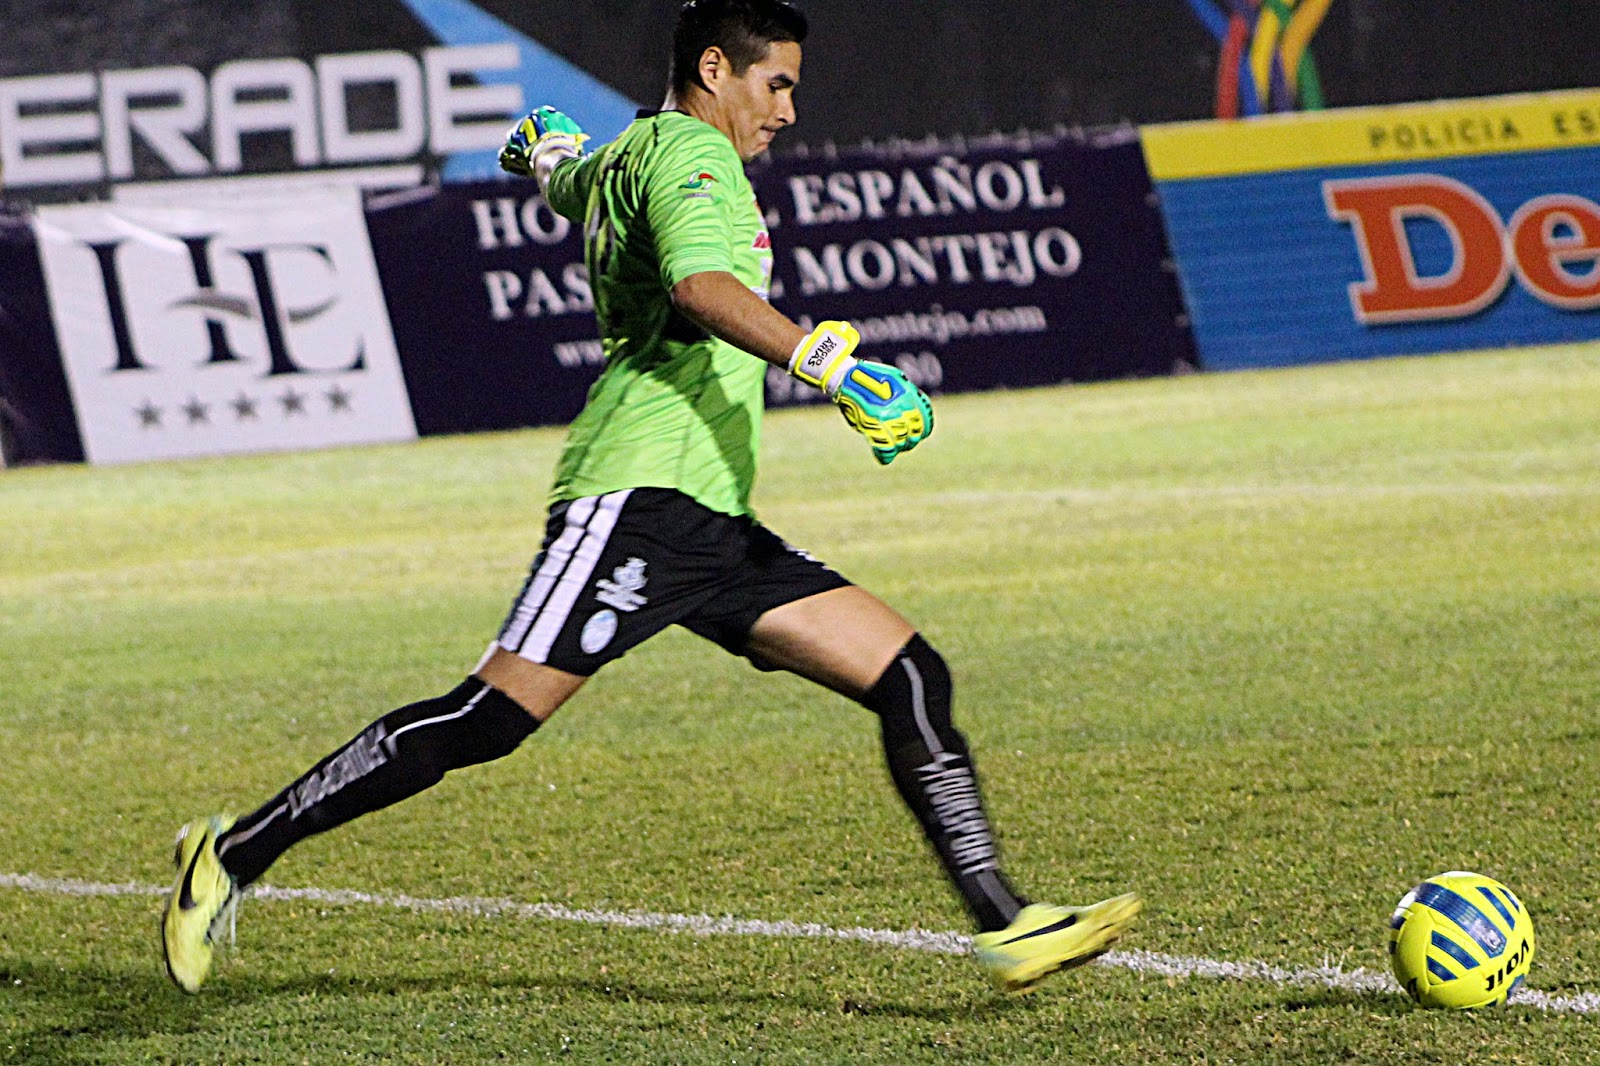 (Foto: Podio deportes)